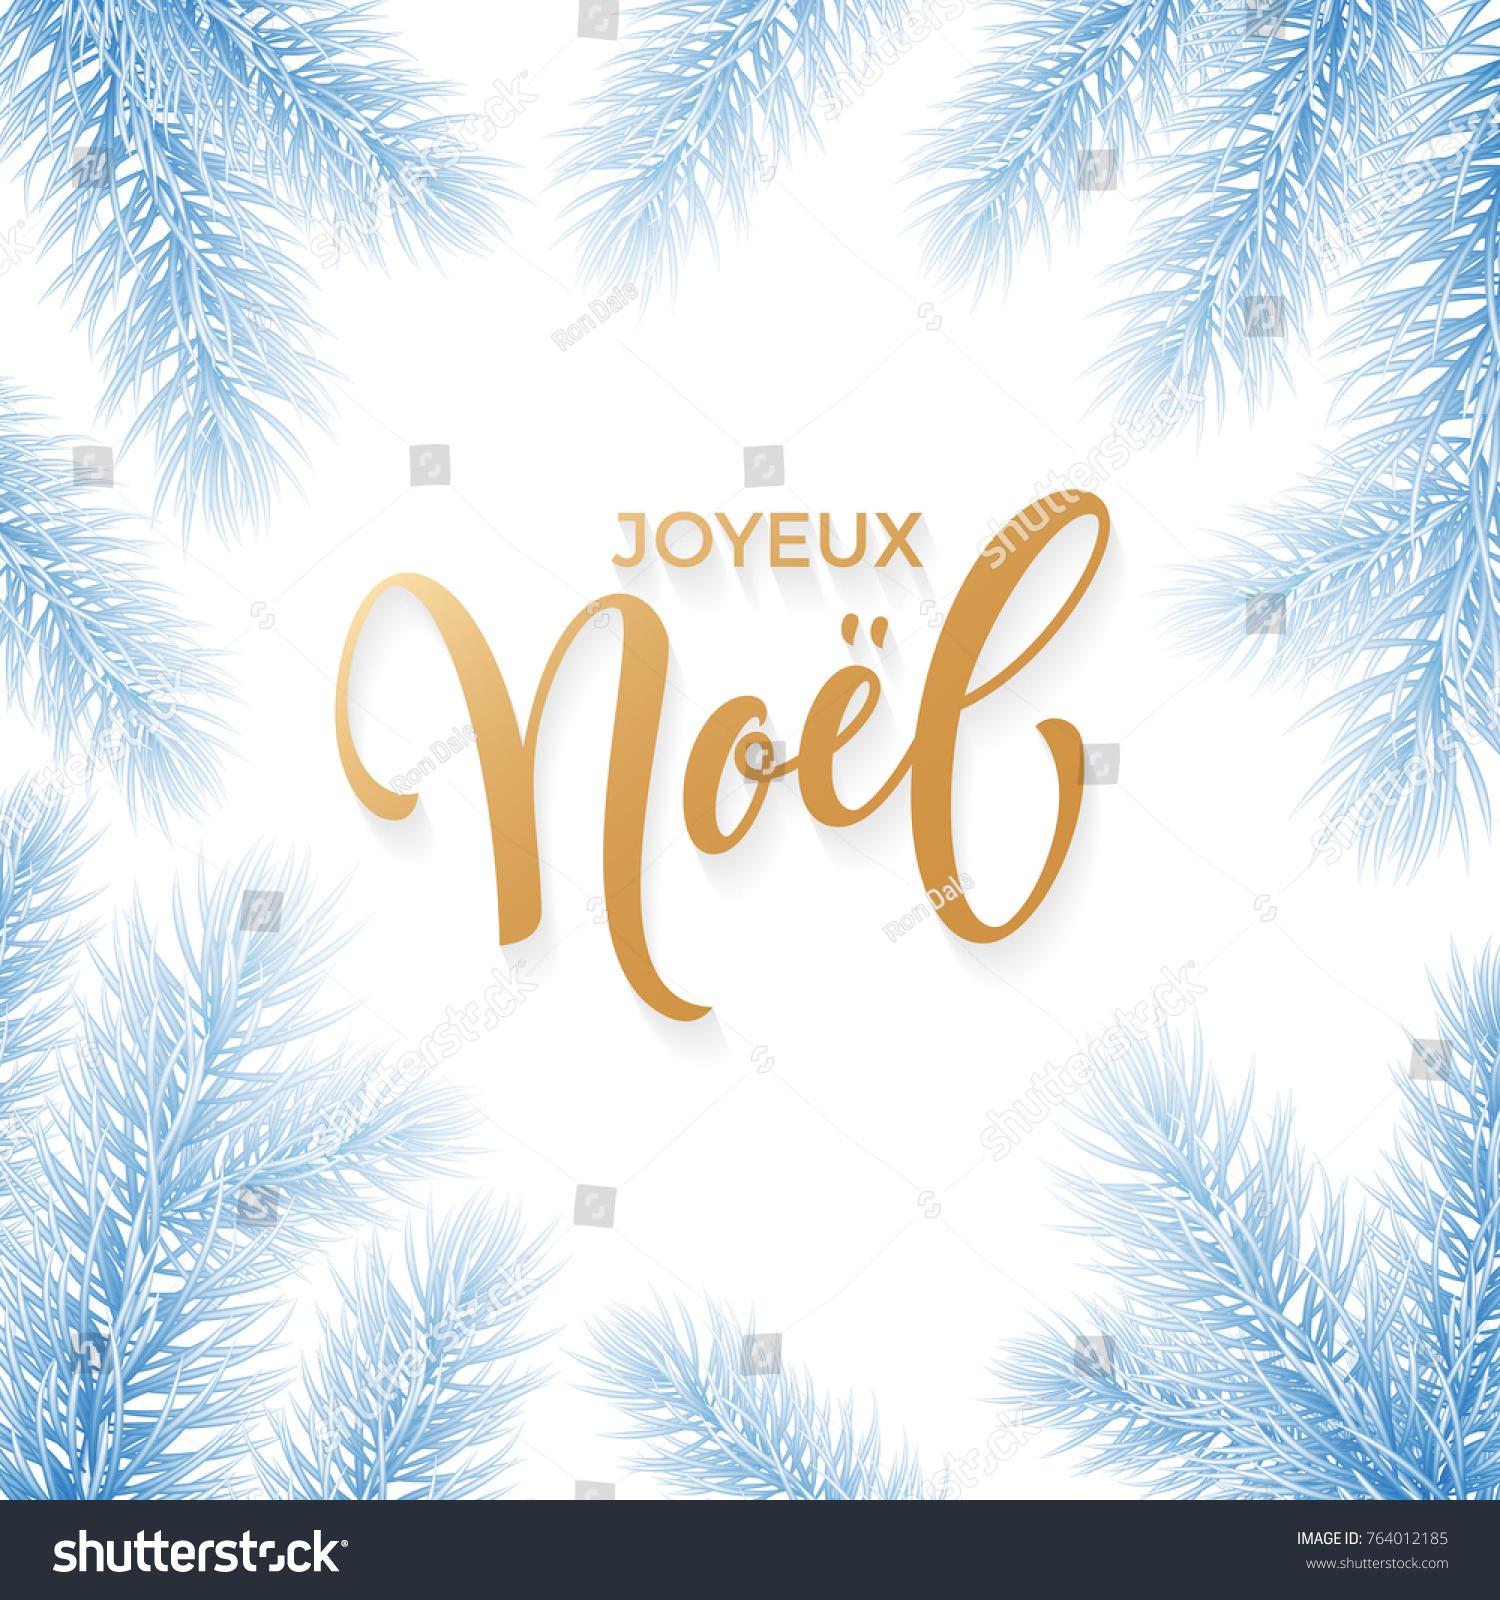 Joyeux noel text holiday greetings merry christmas and happy joyeux noel french merry christmas holiday stock vector 764012185 stock vector joyeux noel french merry christmas m4hsunfo